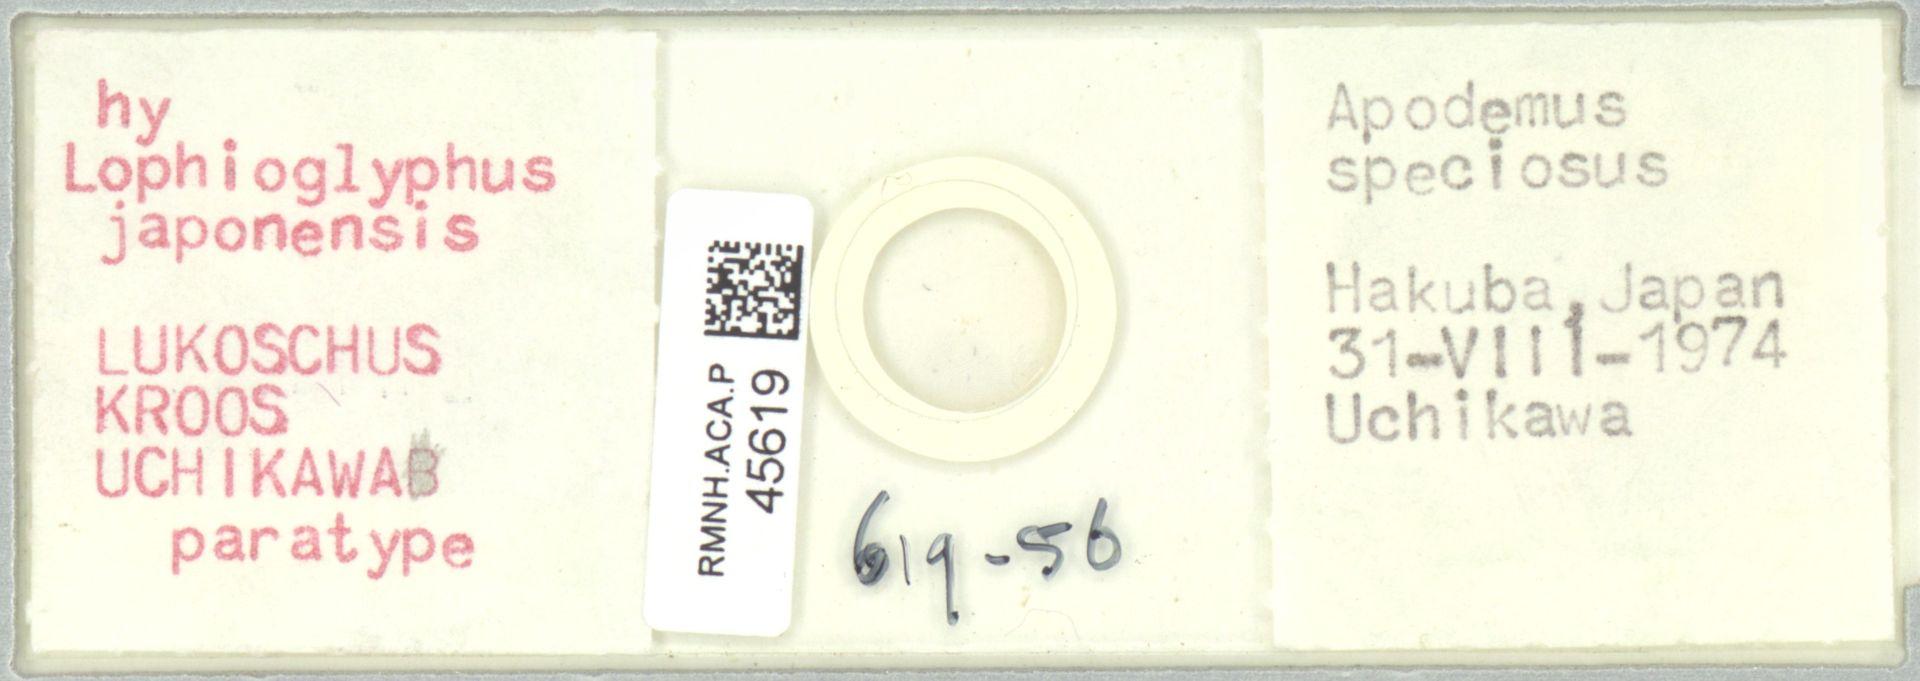 RMNH.ACA.P.45619   Lophioglyphus japonensis Lukoschus Kroos Uchikawa